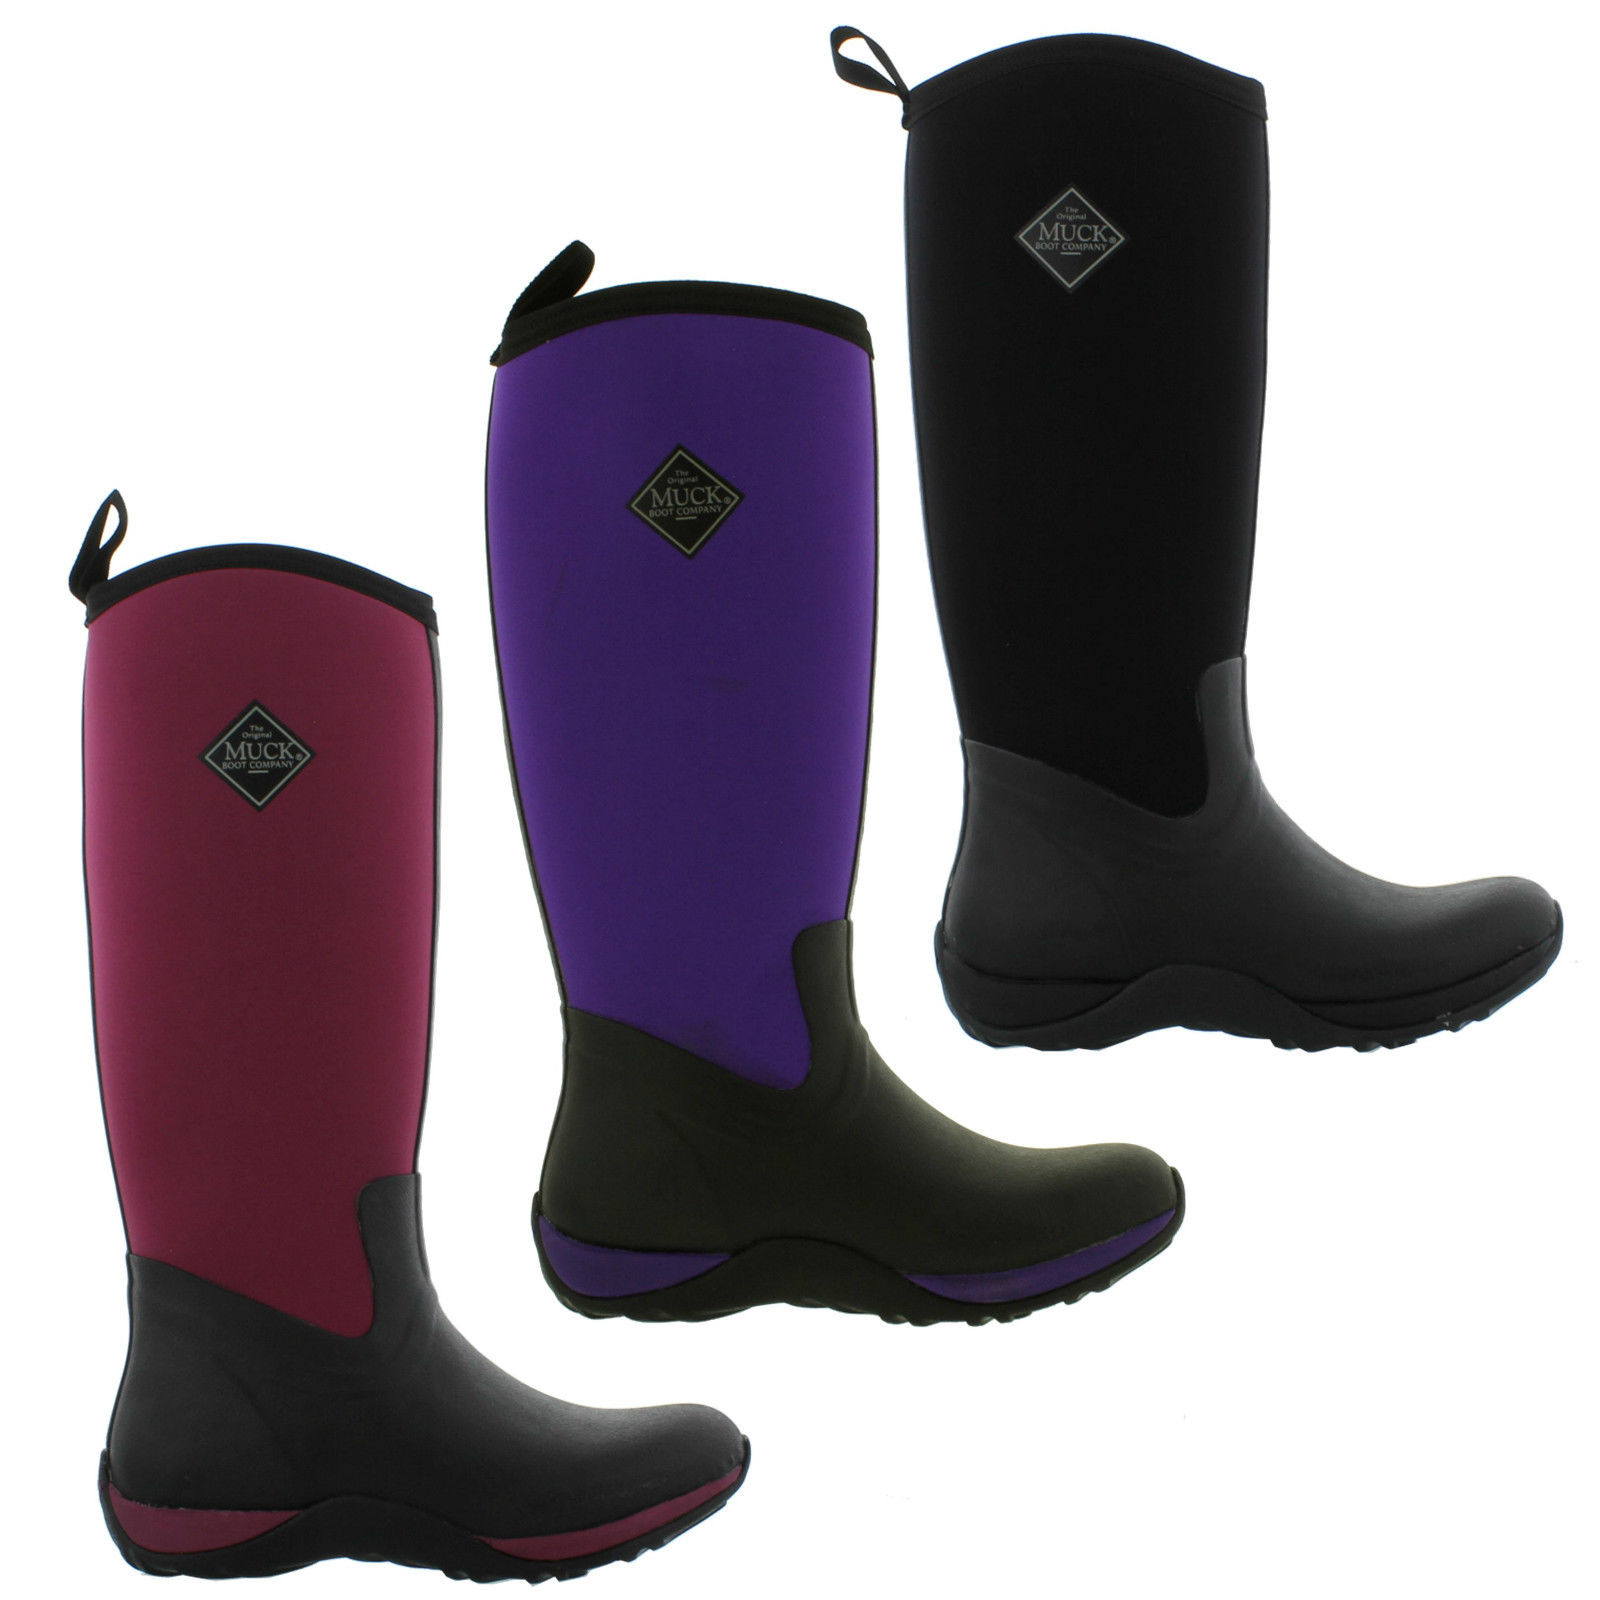 745cd0c94f3 Details about Muck Boots Arctic Adventure Womens Ladies Wellington Neoprene  Wellies Size 4-8